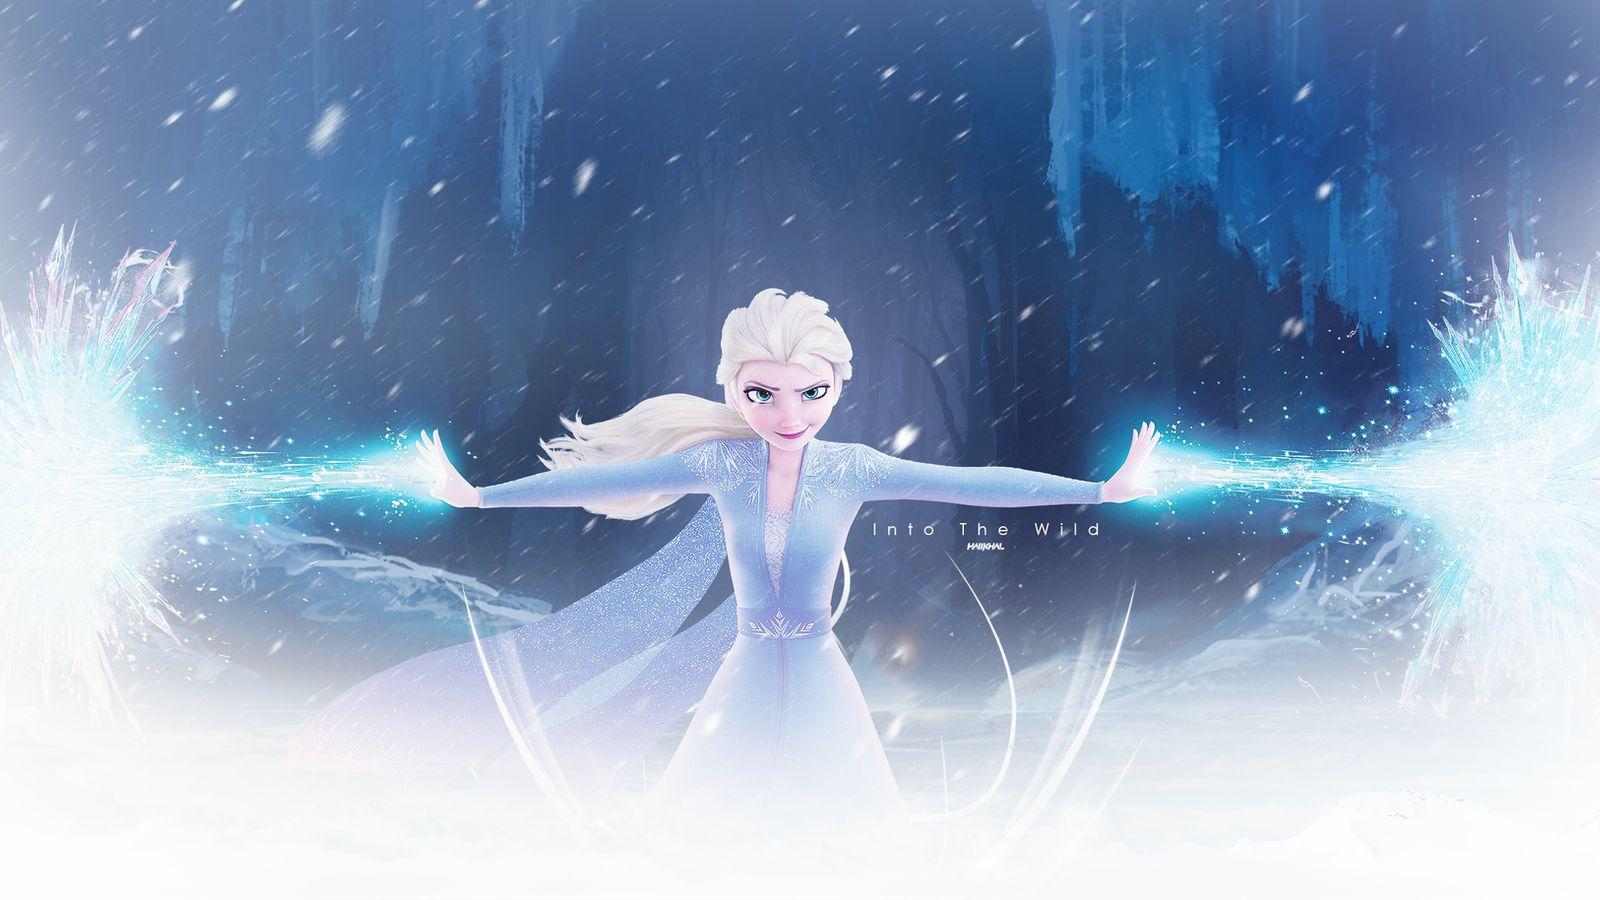 Frozen 2 wallpaper